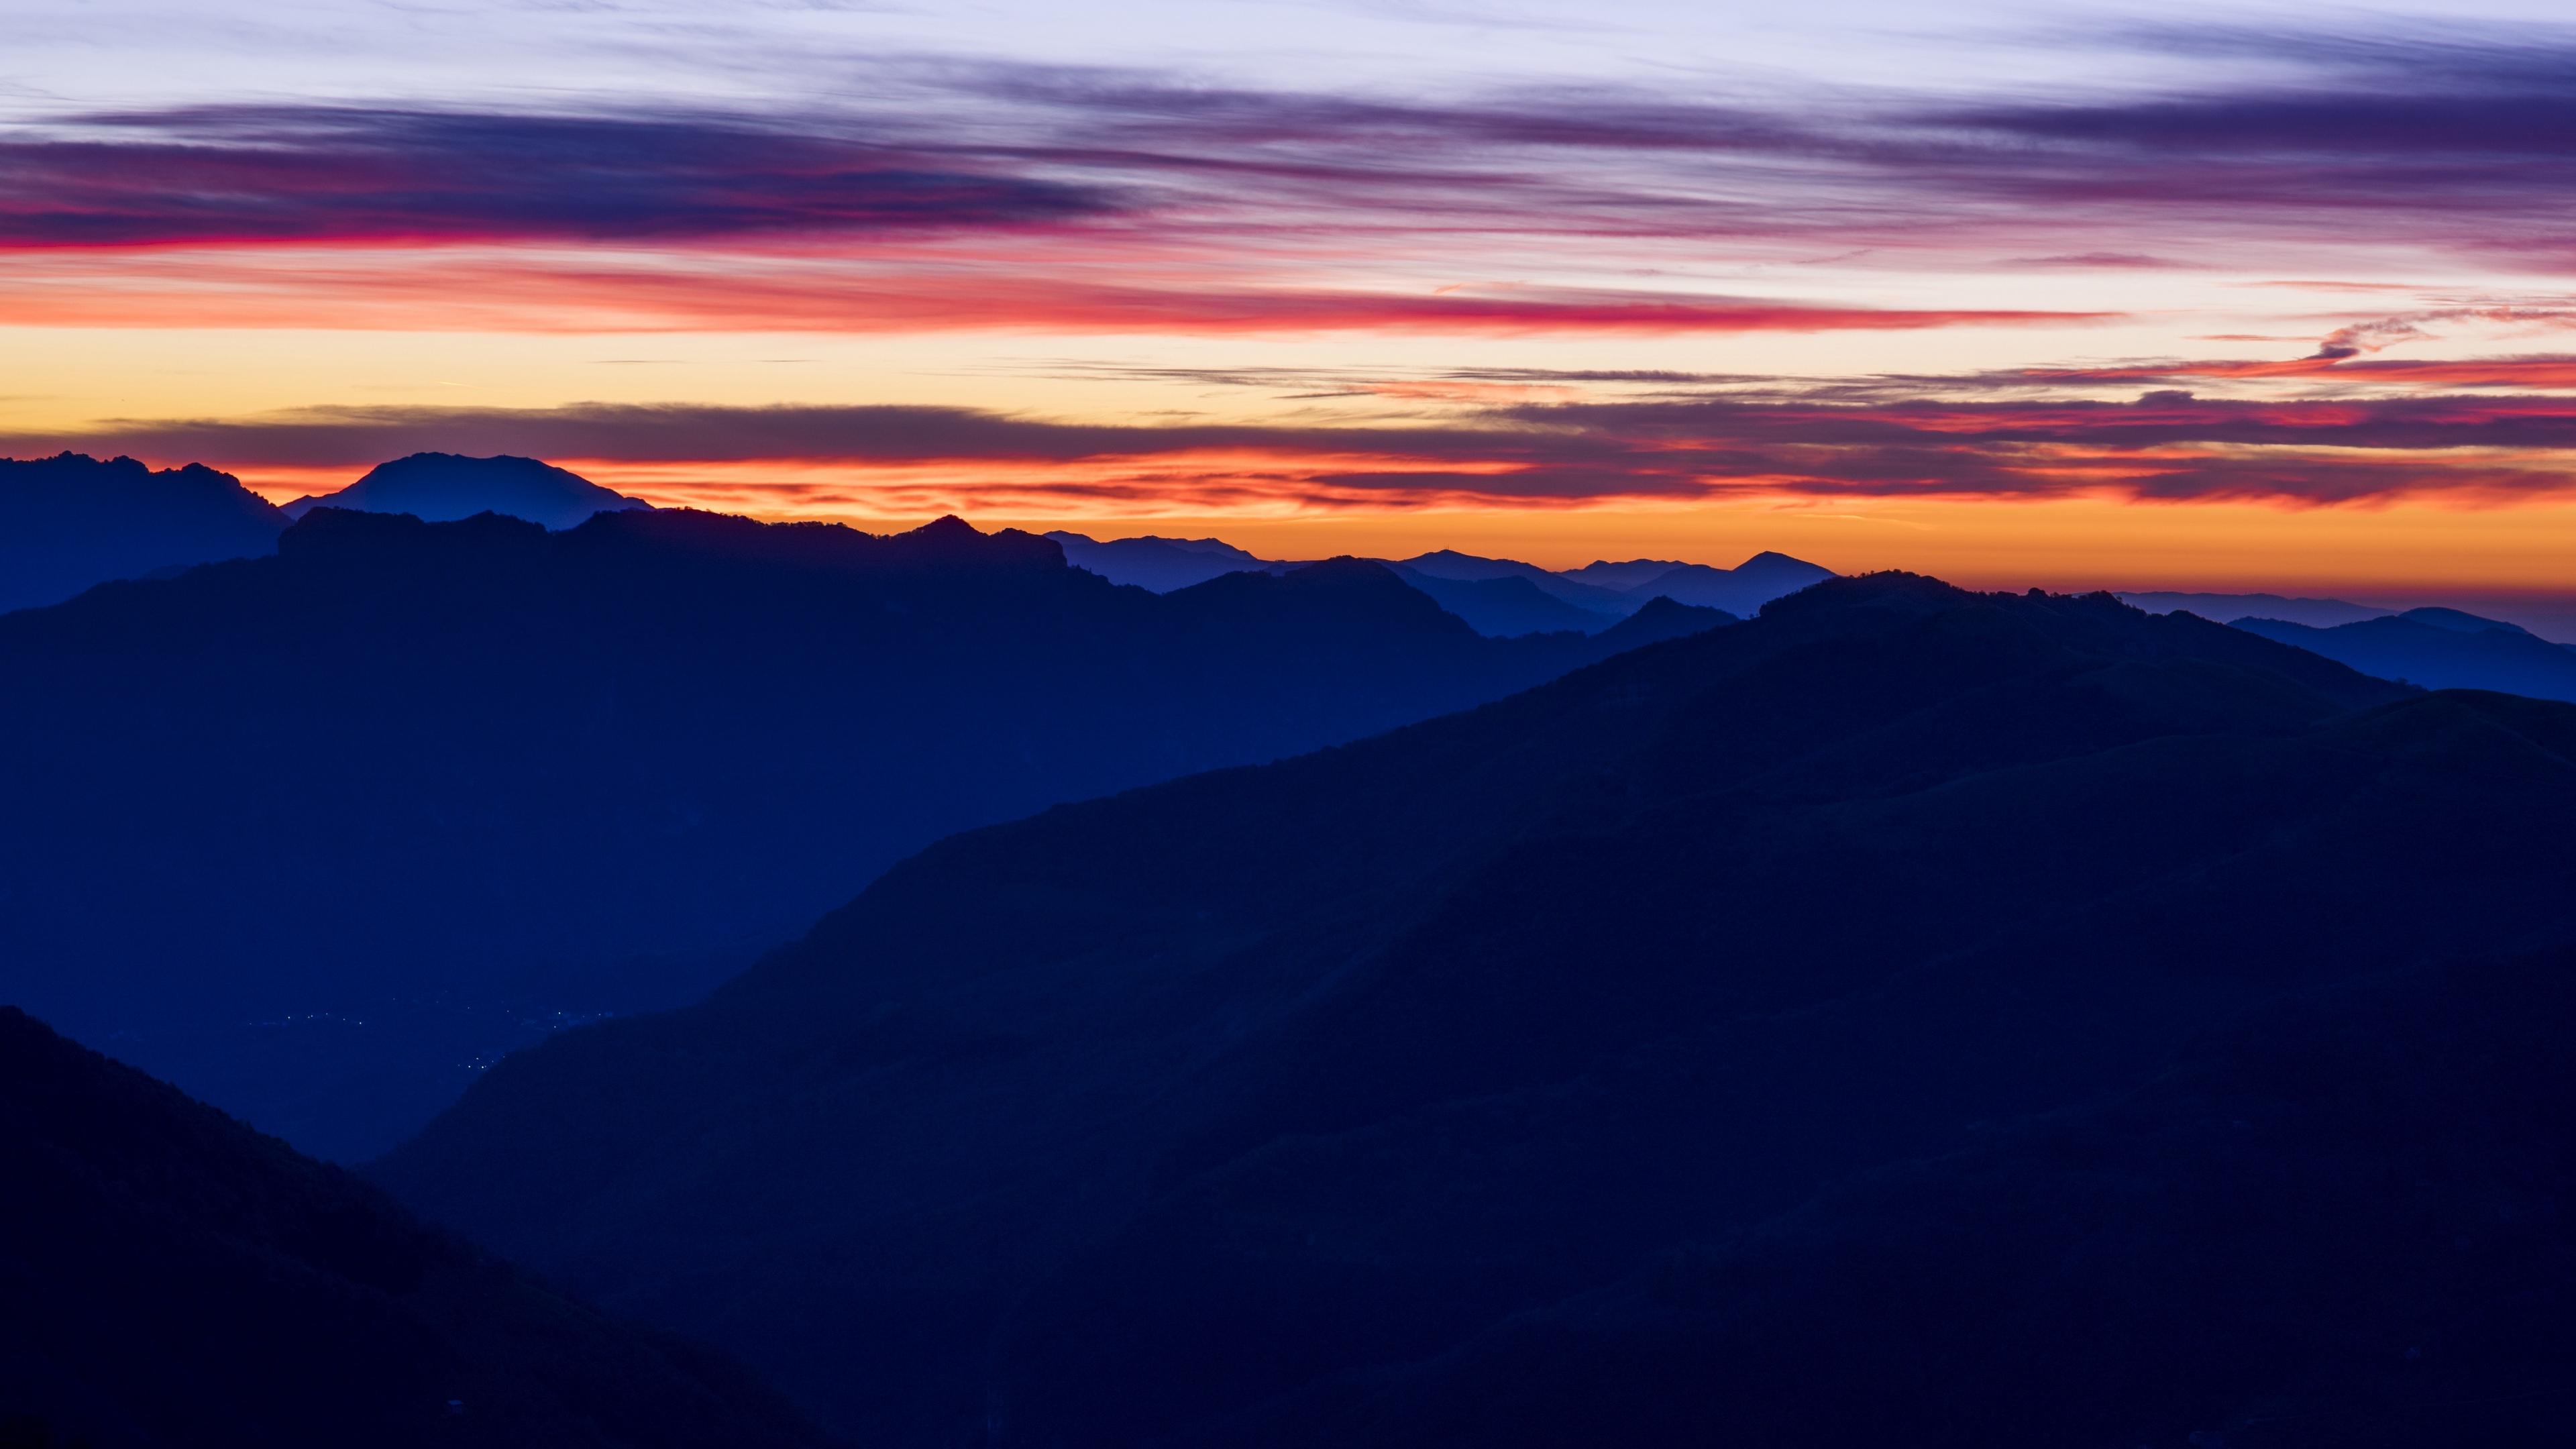 sunset mountains sky 4k 1541114512 - sunset, mountains, sky 4k - sunset, Sky, Mountains